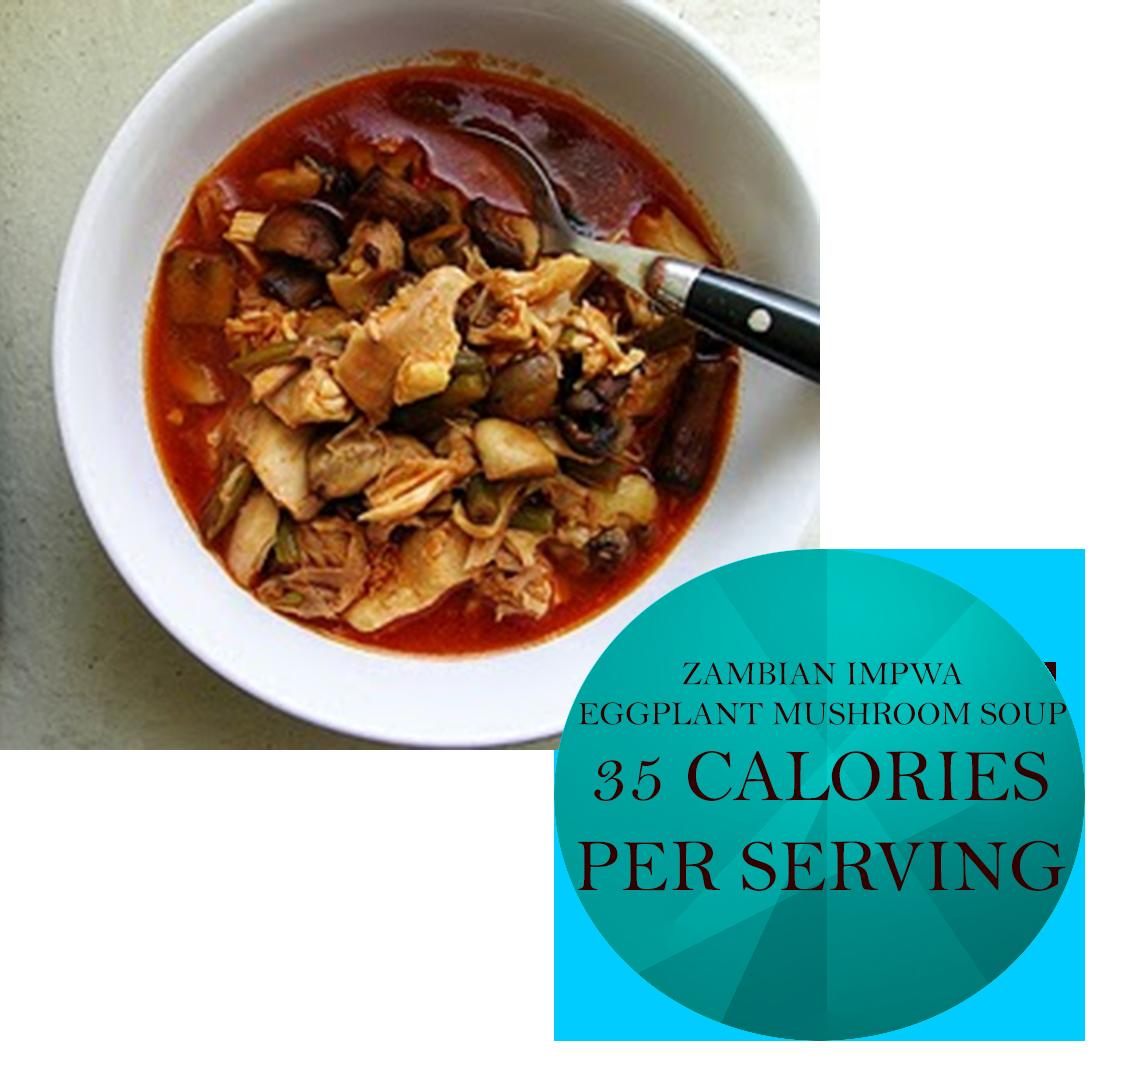 Getting your goat cookbook eggplants mushroom soup and egg food forumfinder Gallery